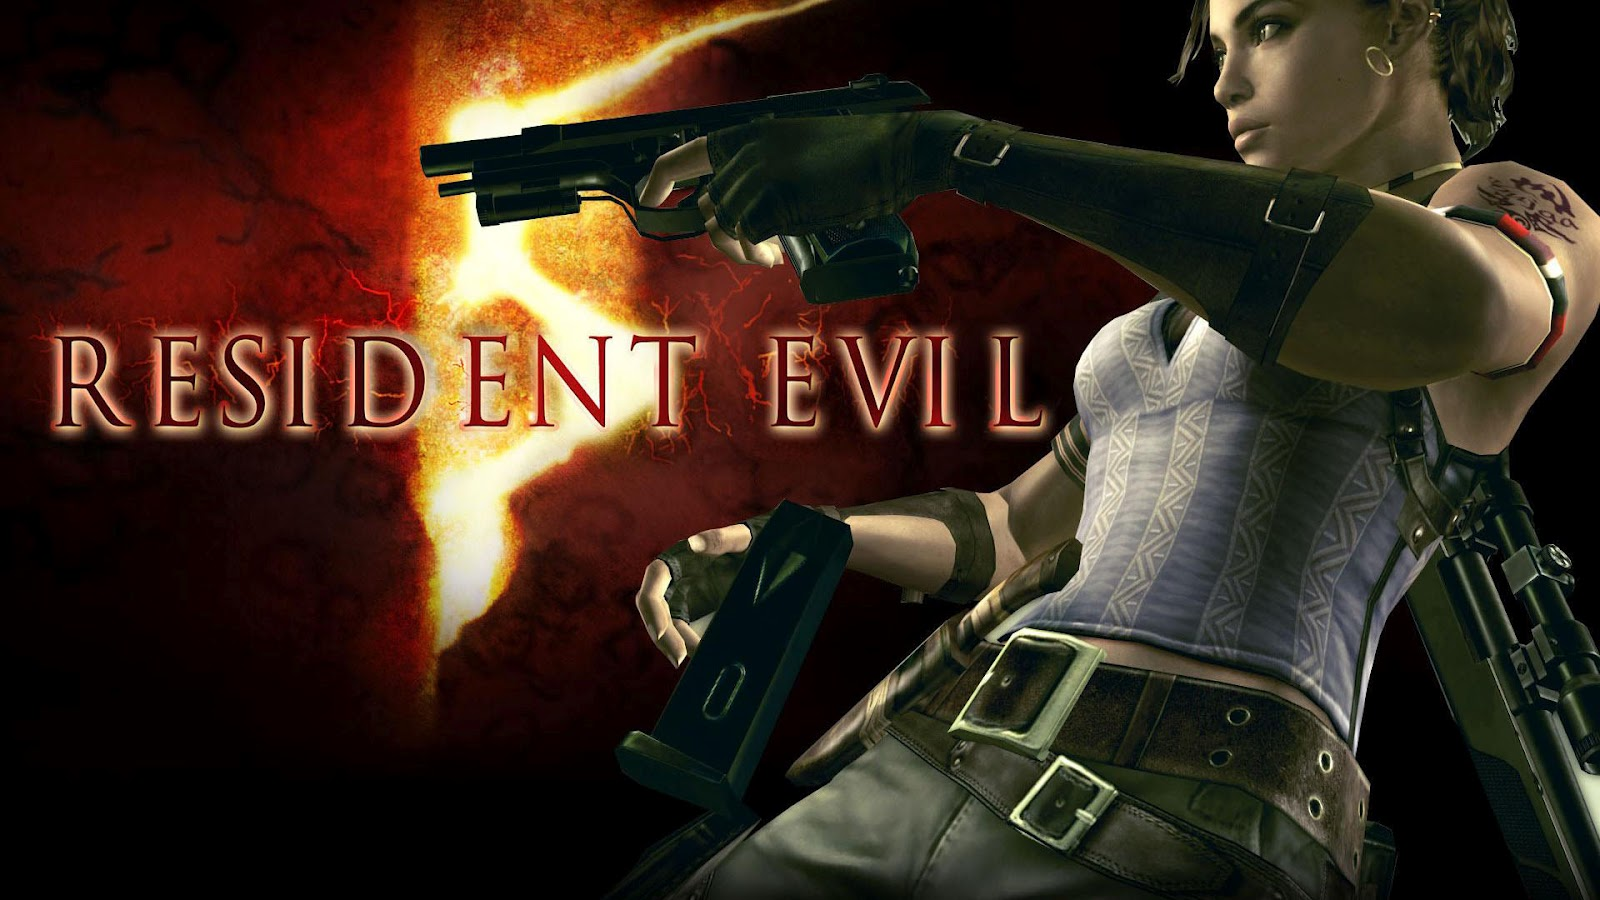 Free Download Residentevil5wallpapers8 Resident Evil 5 Wallpapers